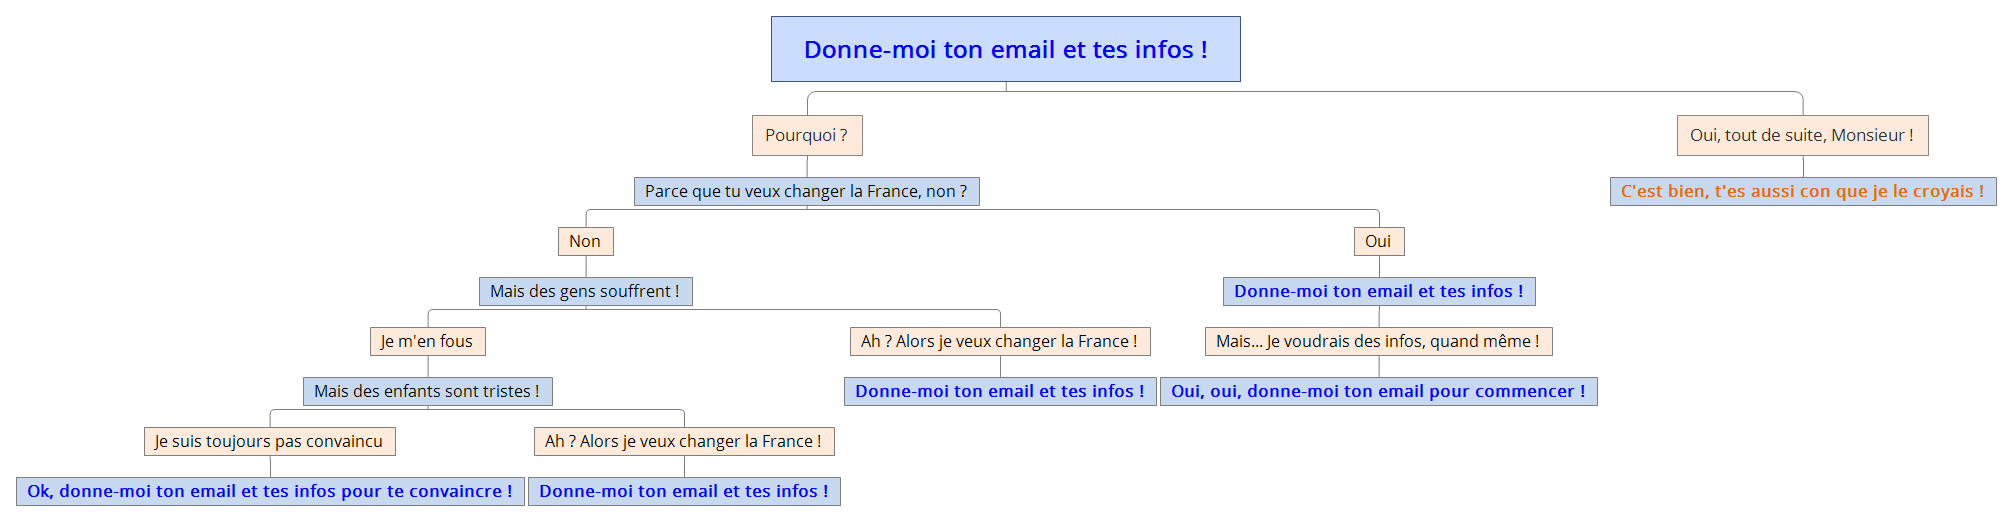 0-site-emmanuel-macron